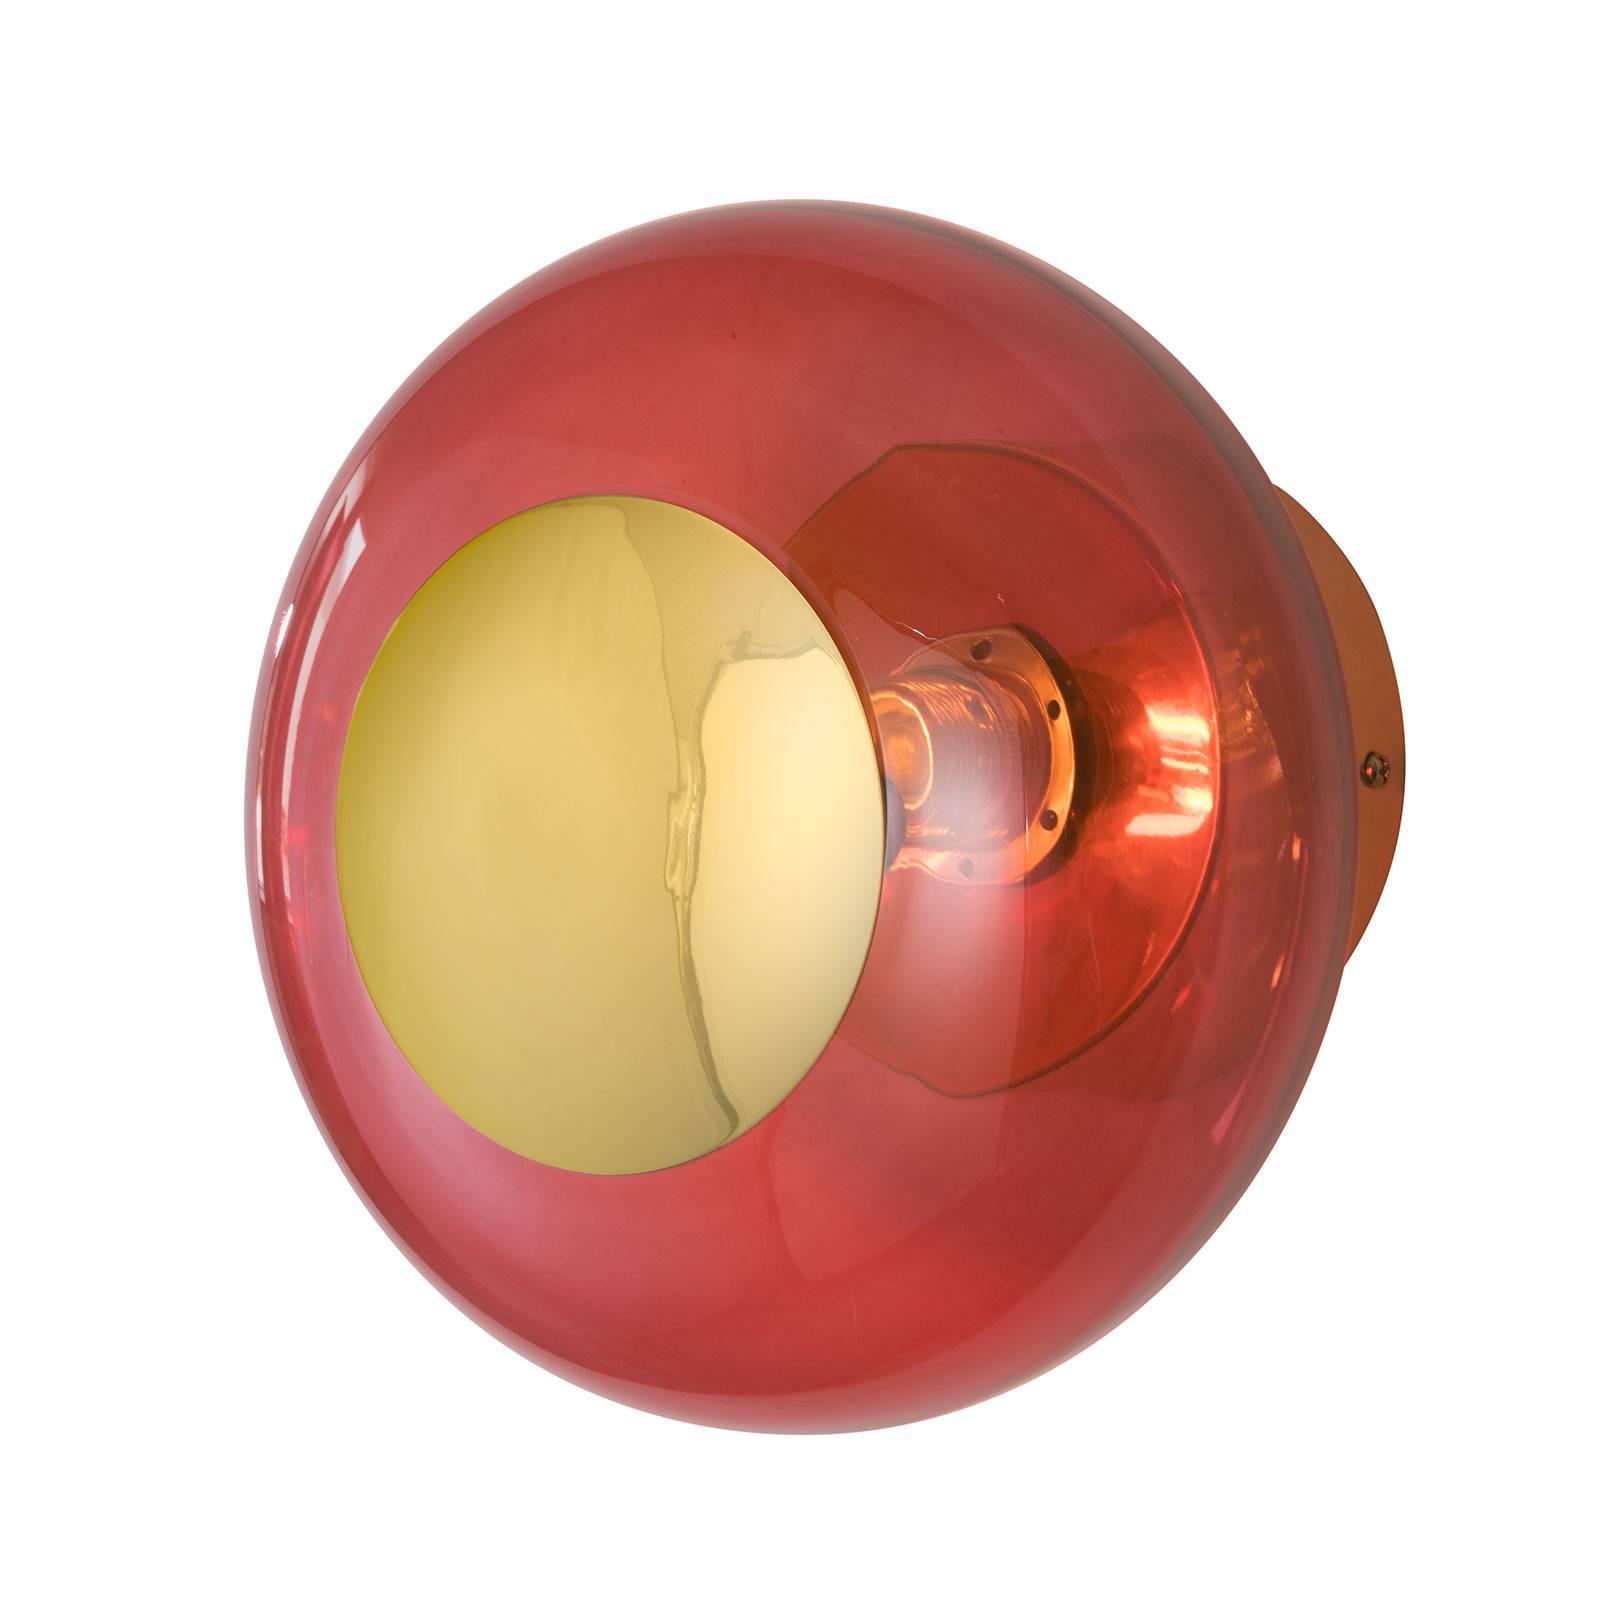 EBB & FLOW Horizon -pidin kulta/punainen Ø 21 cm